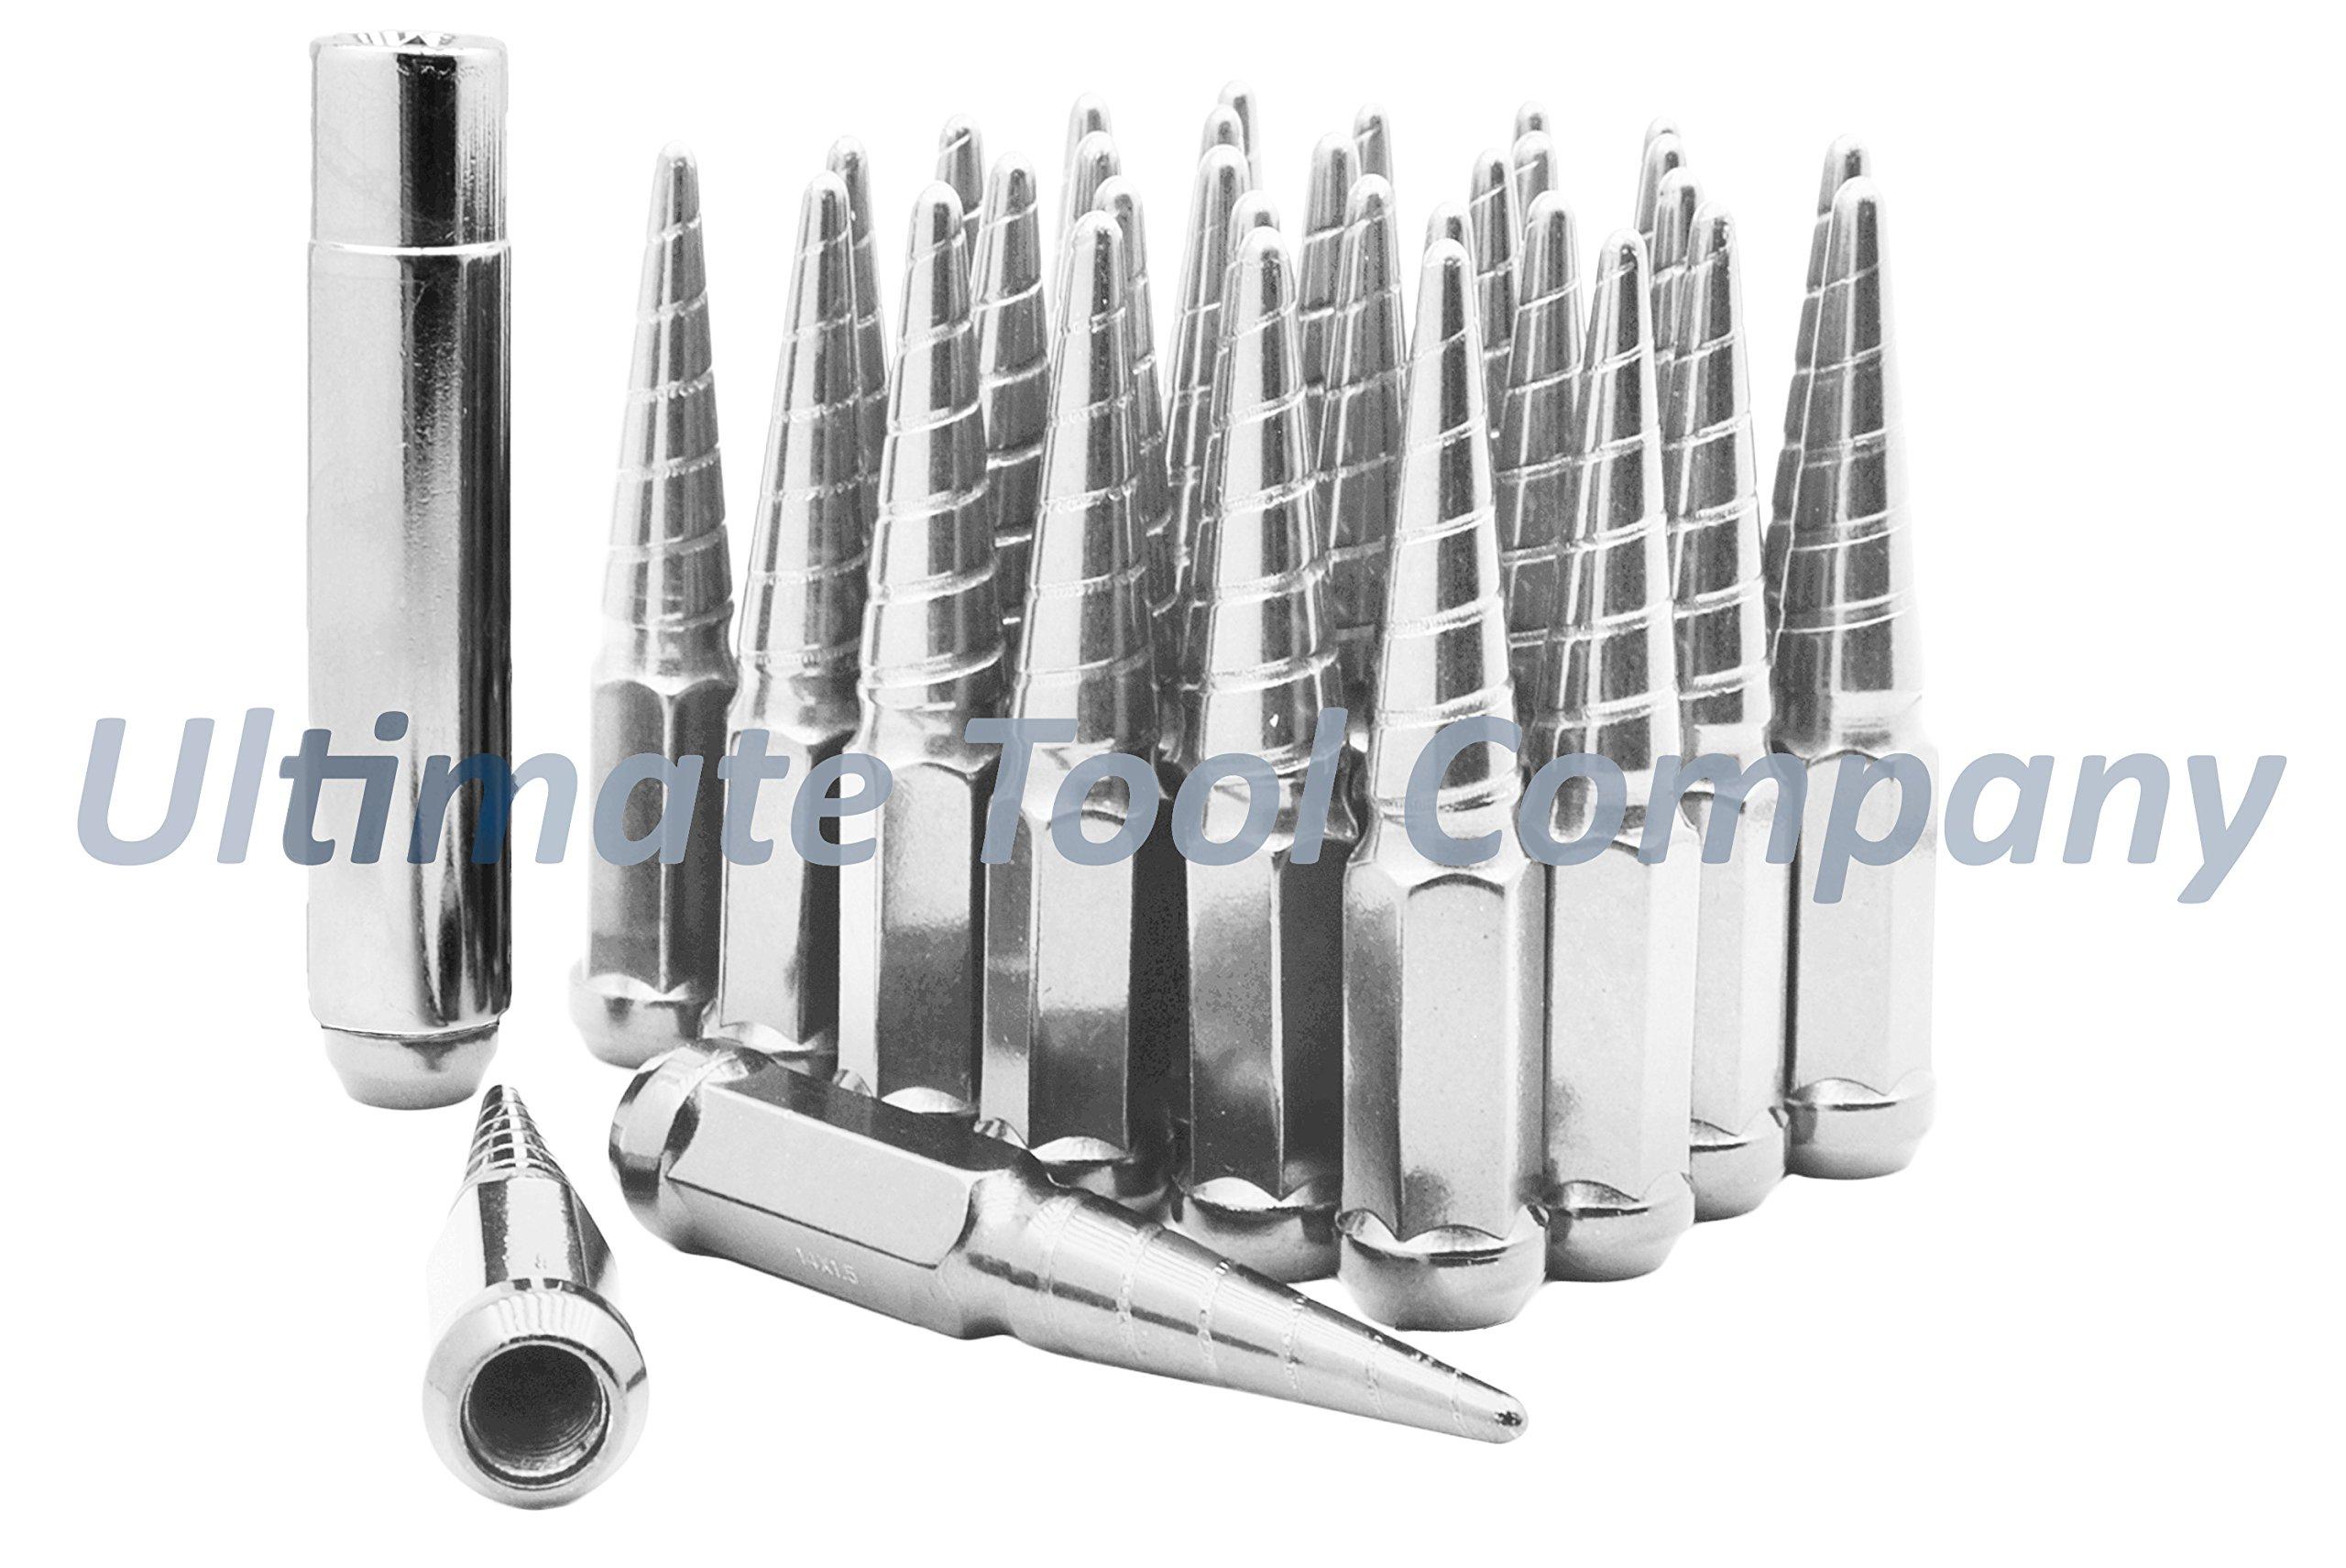 UTC 32x M14x1.5 Chrome Twisted 4.5'' Solid Steel Spike Lug Nut Set w/Socket Key for Secure Removal